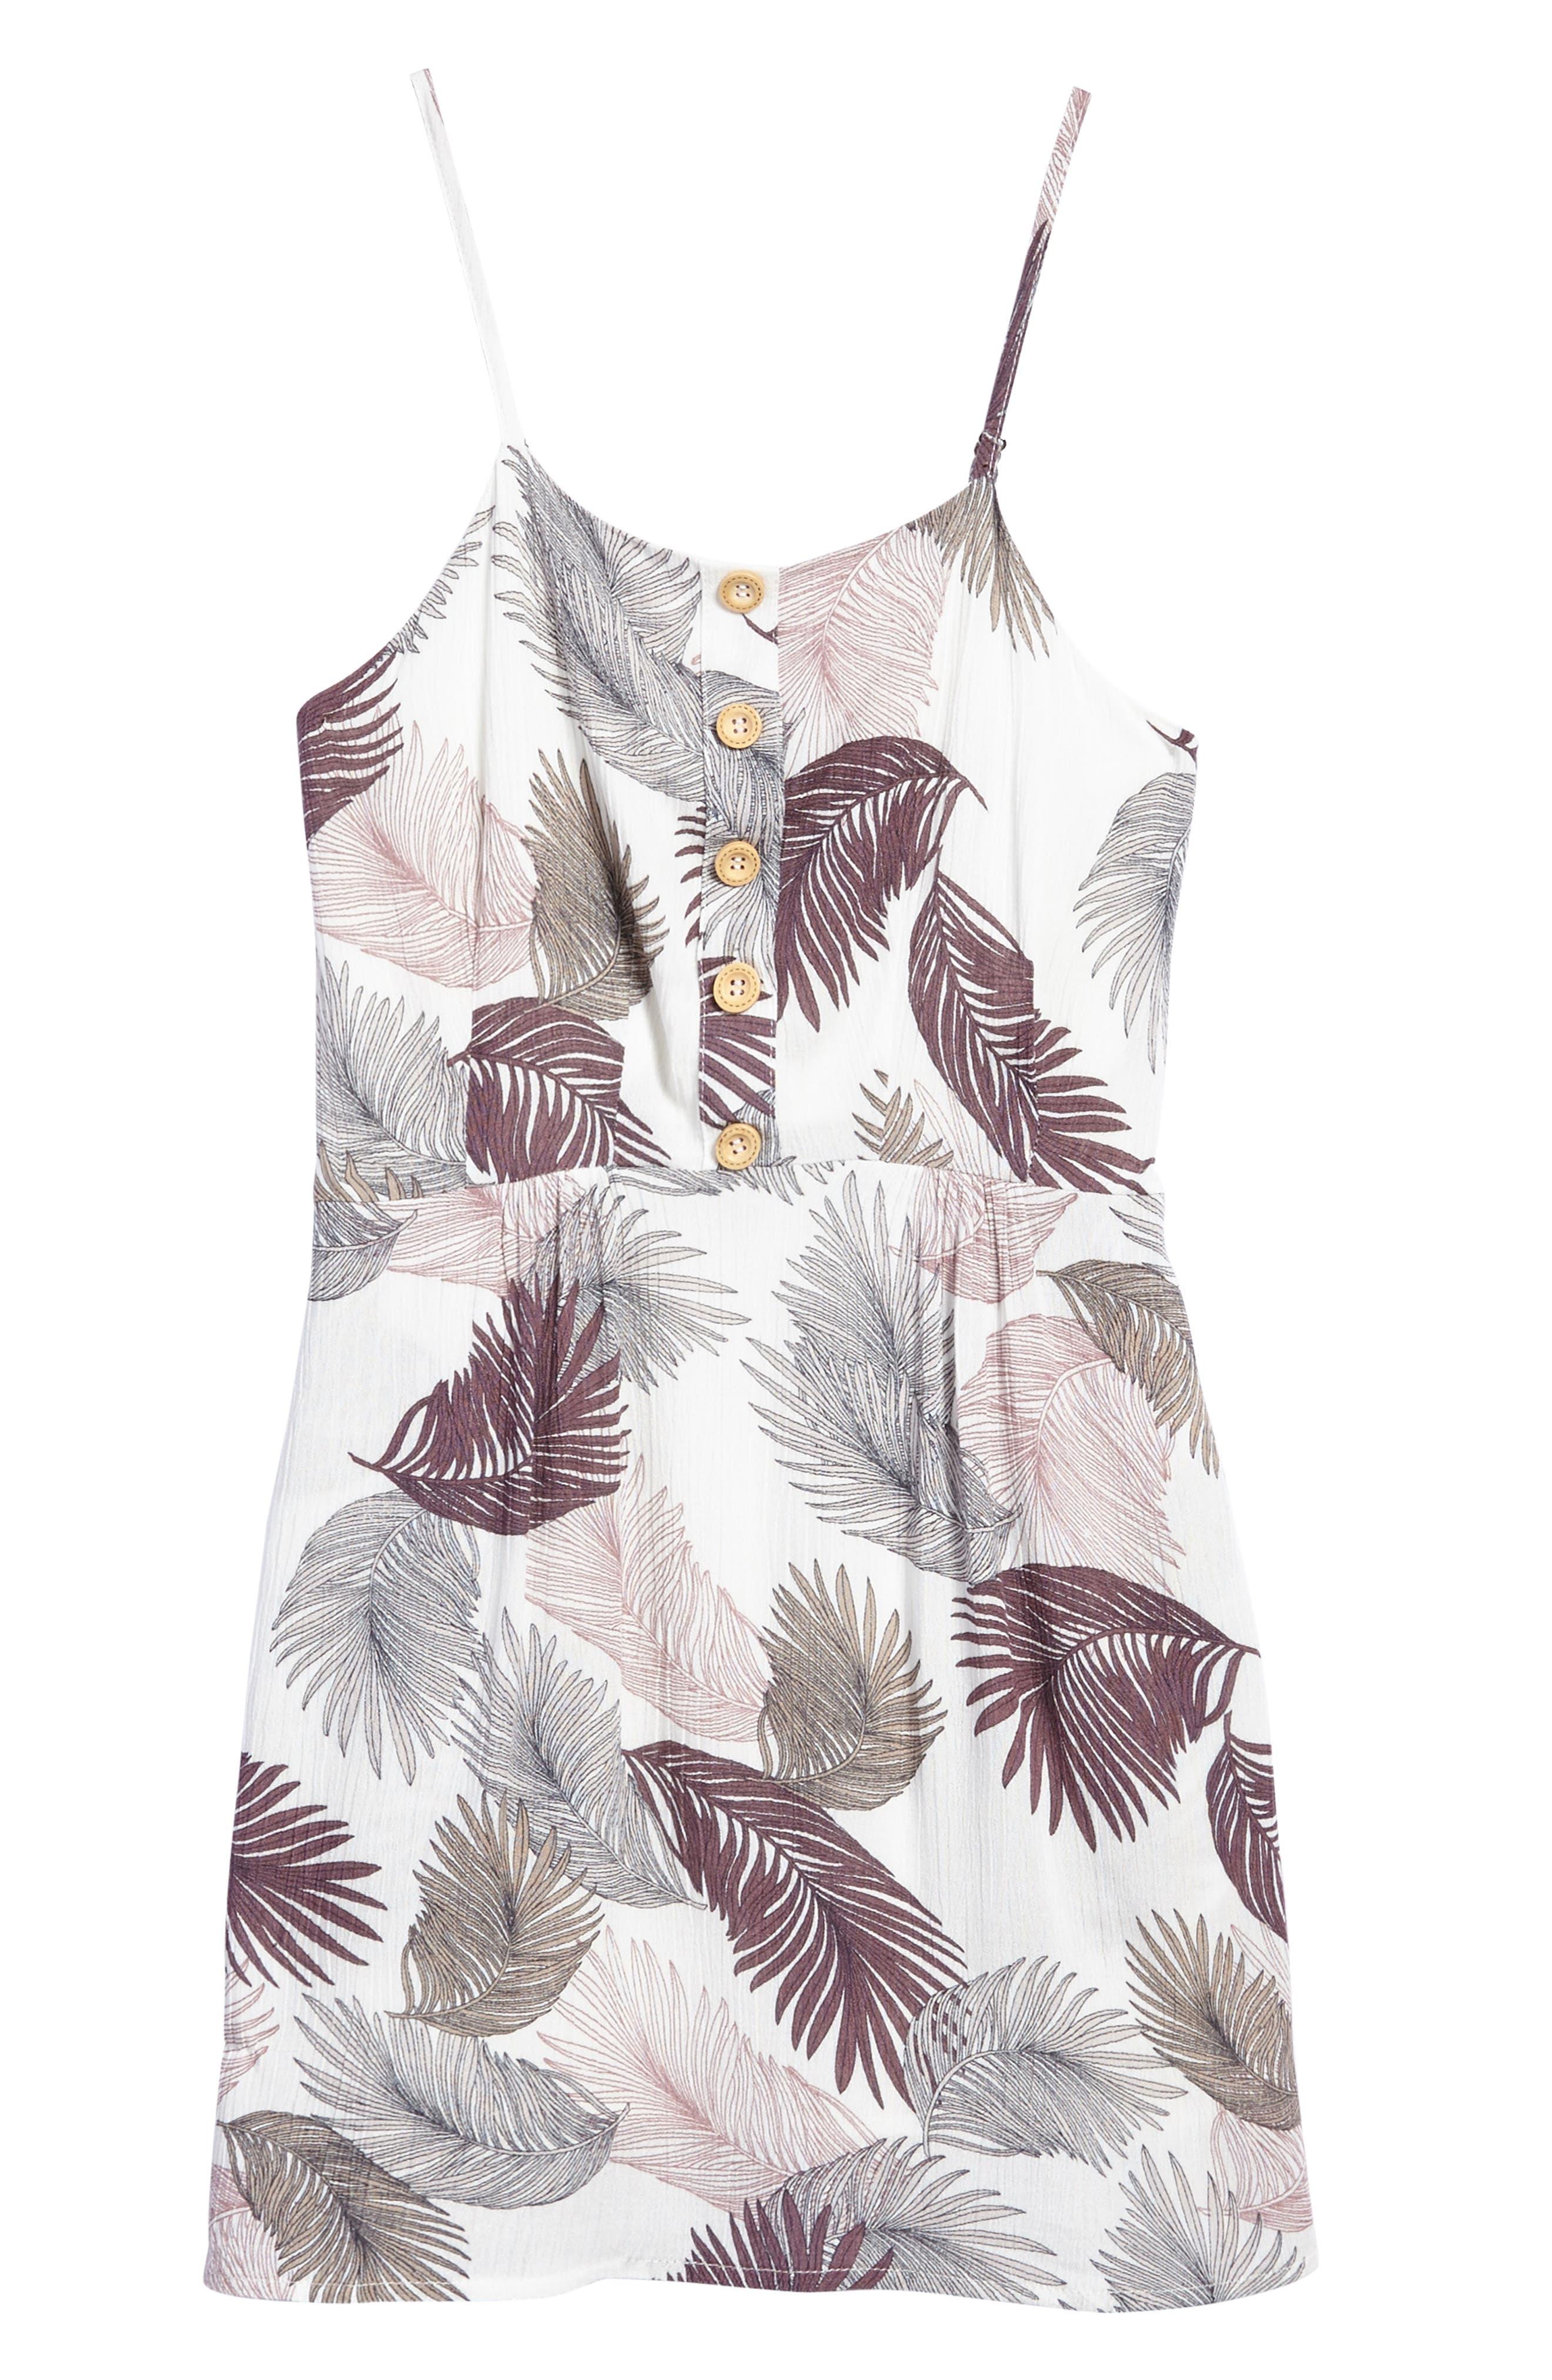 Alternate Image 1 Selected - For All Seasons Print Tank Dress (Big Girls)